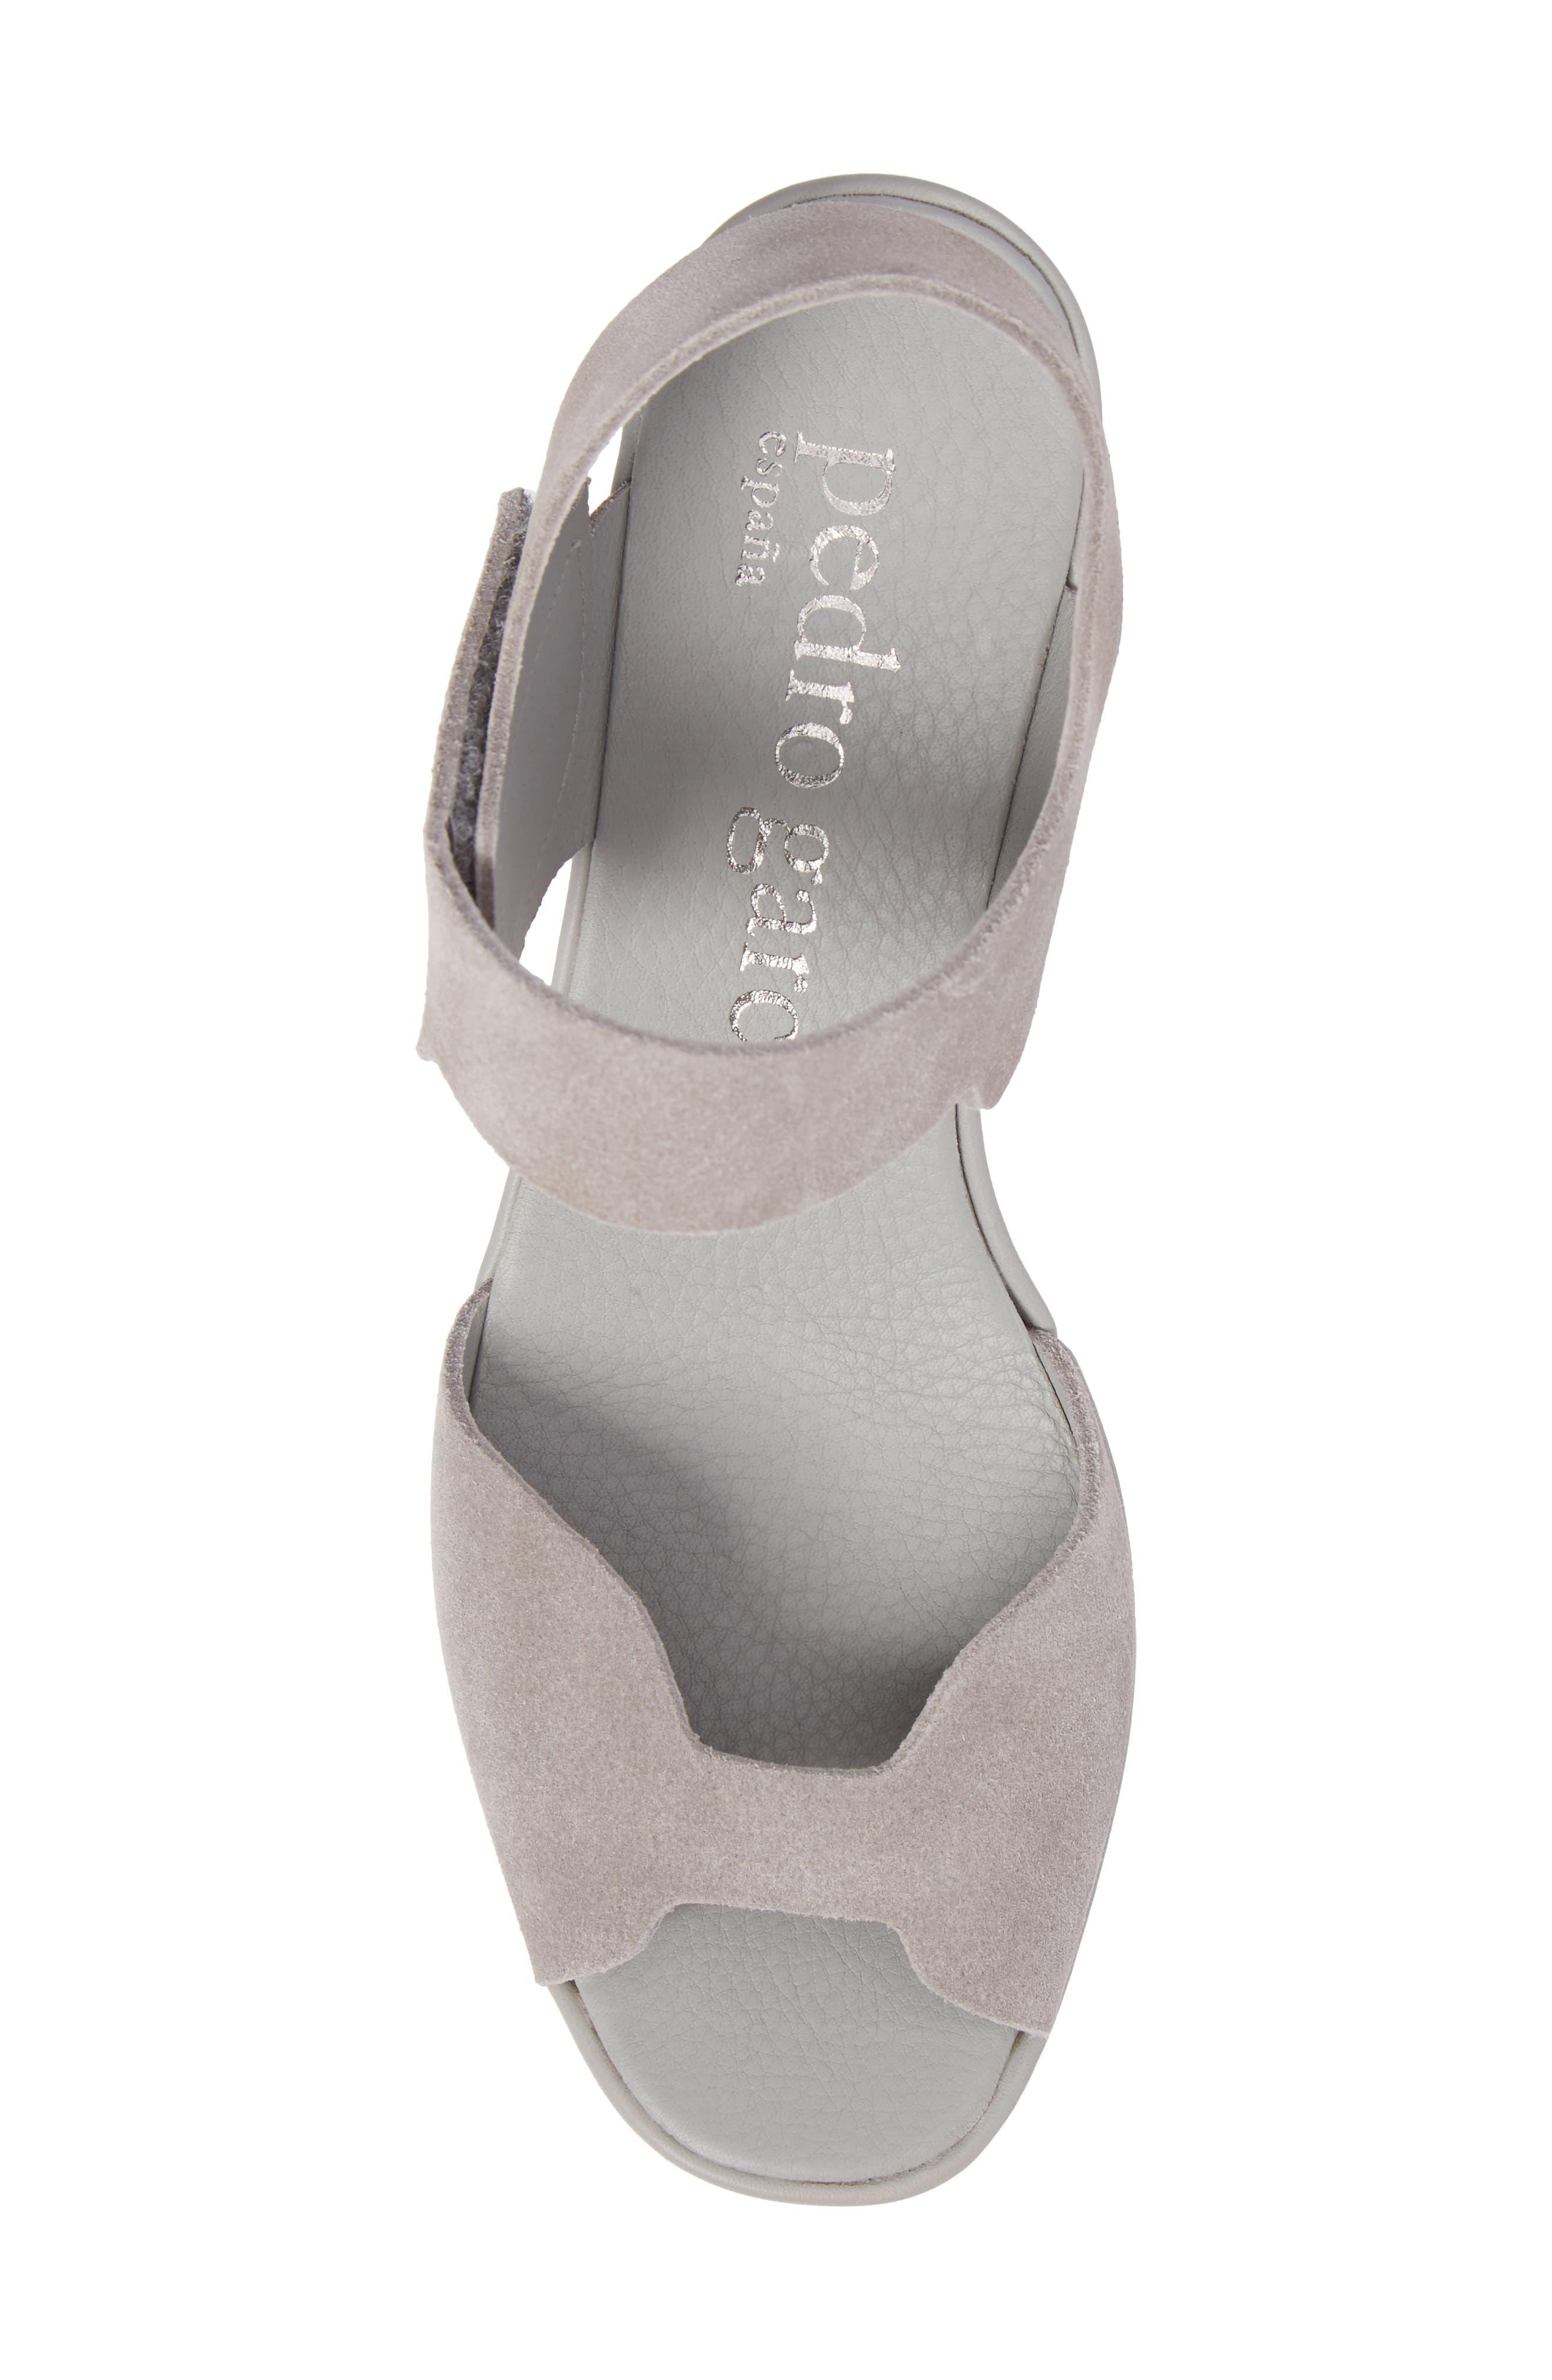 Fah Platform Wedge Sandal,                             Alternate thumbnail 5, color,                             Pumice Castoro